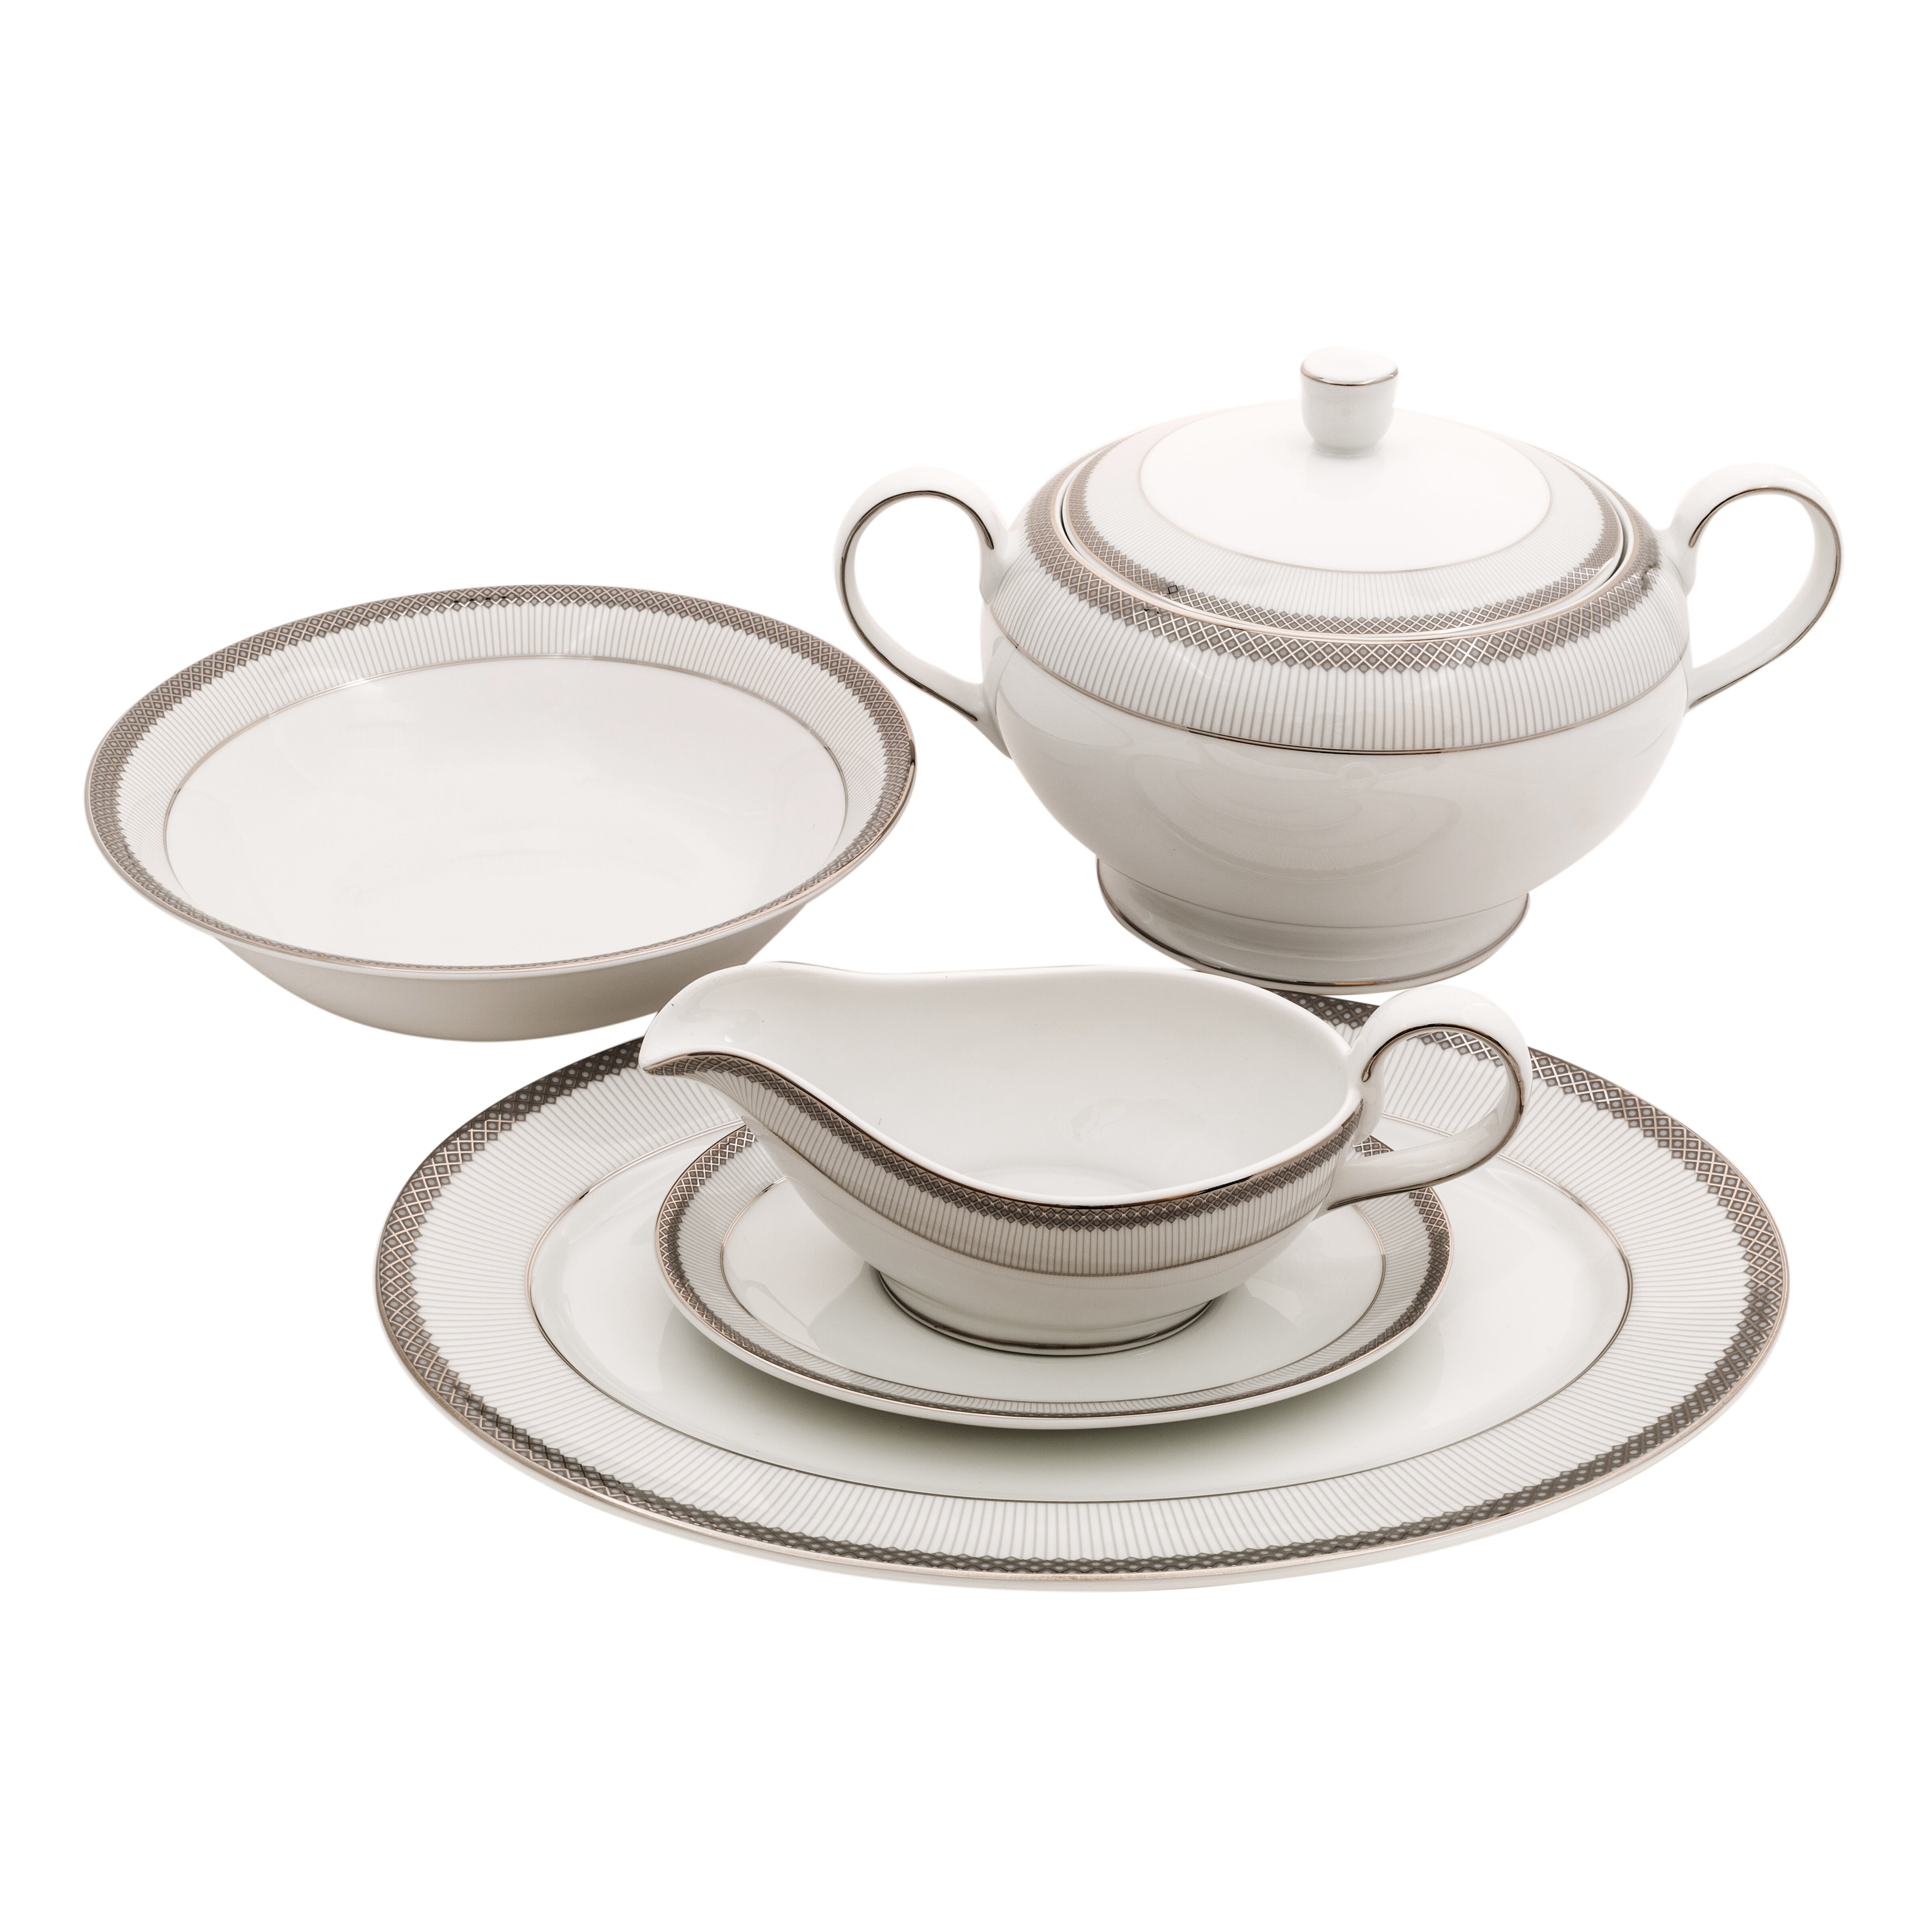 Shinepukur Ceramics USA Inc Diamond Fine China Special Serving 5 Piece Dinn